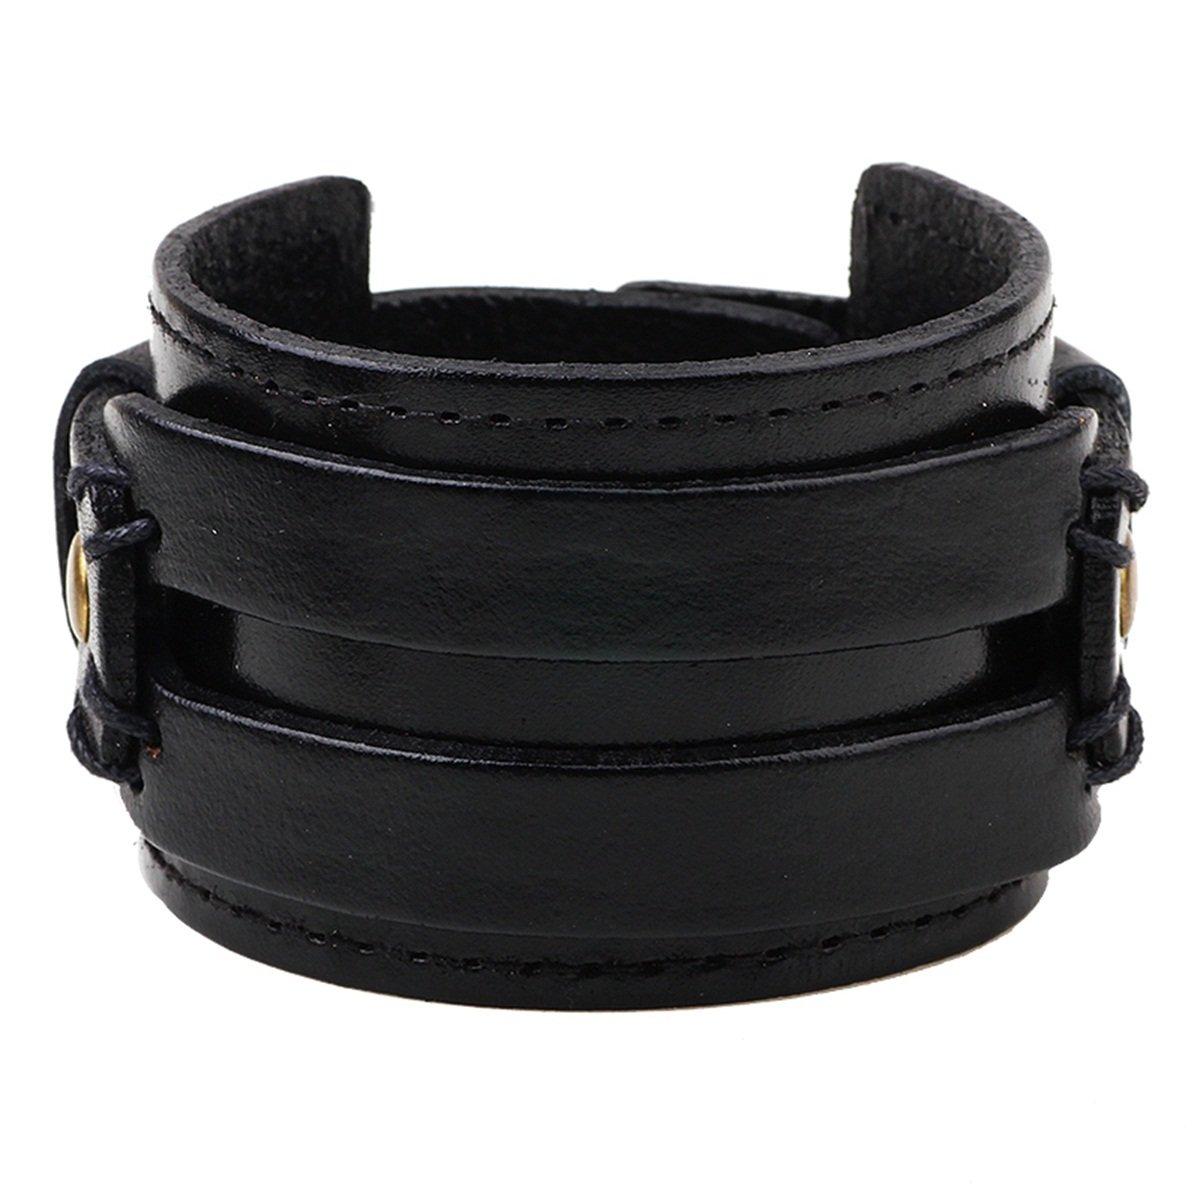 KY Jewelry Spike Studded Rivet Punk Rock Biker Wide Strap Leather Bracelet Chain Wristband Adjustable kuoyue KYV000AK8Y1W